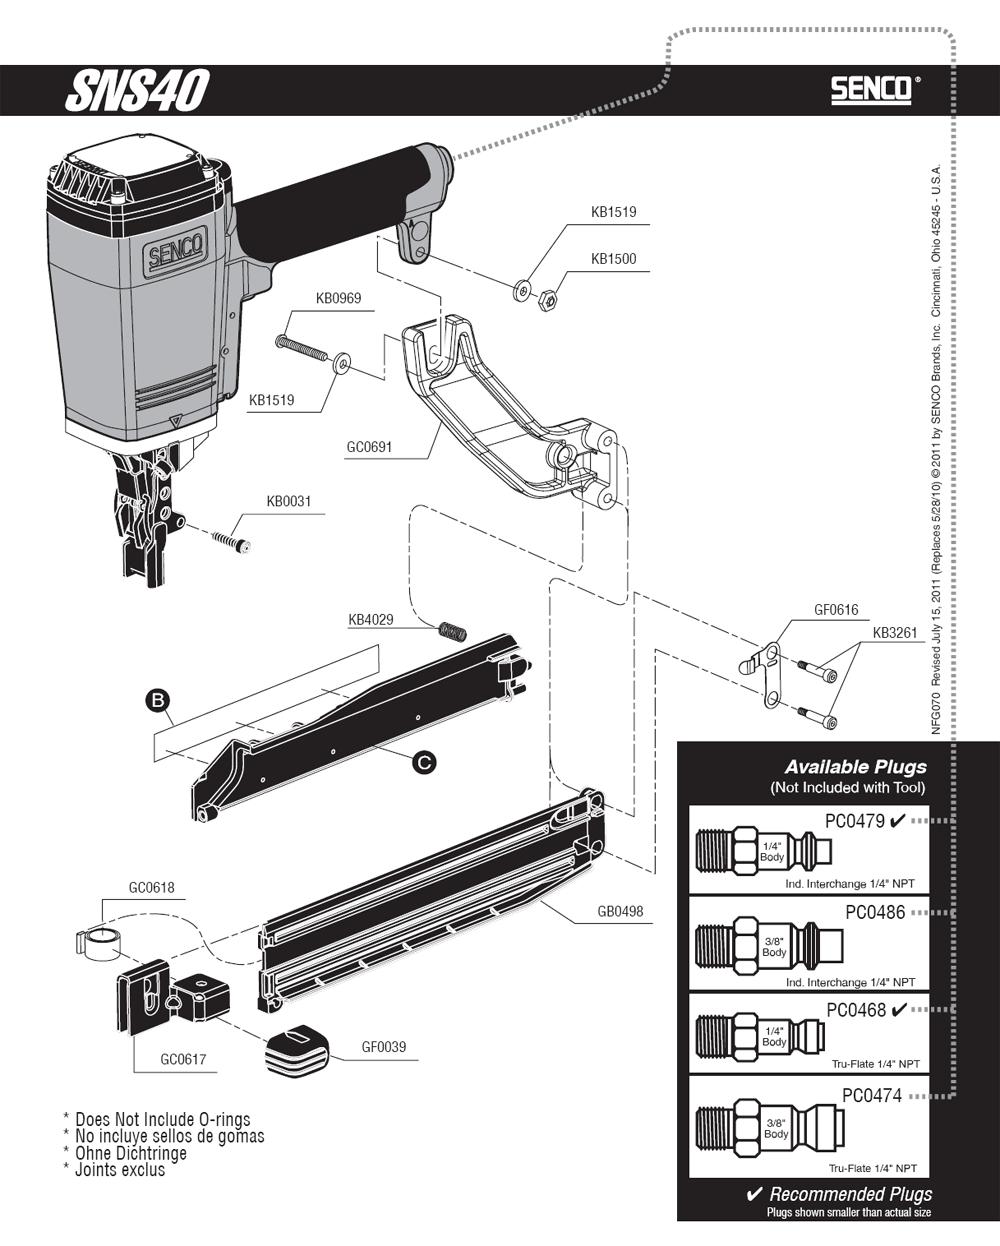 700002N-senco-PB-1Break Down